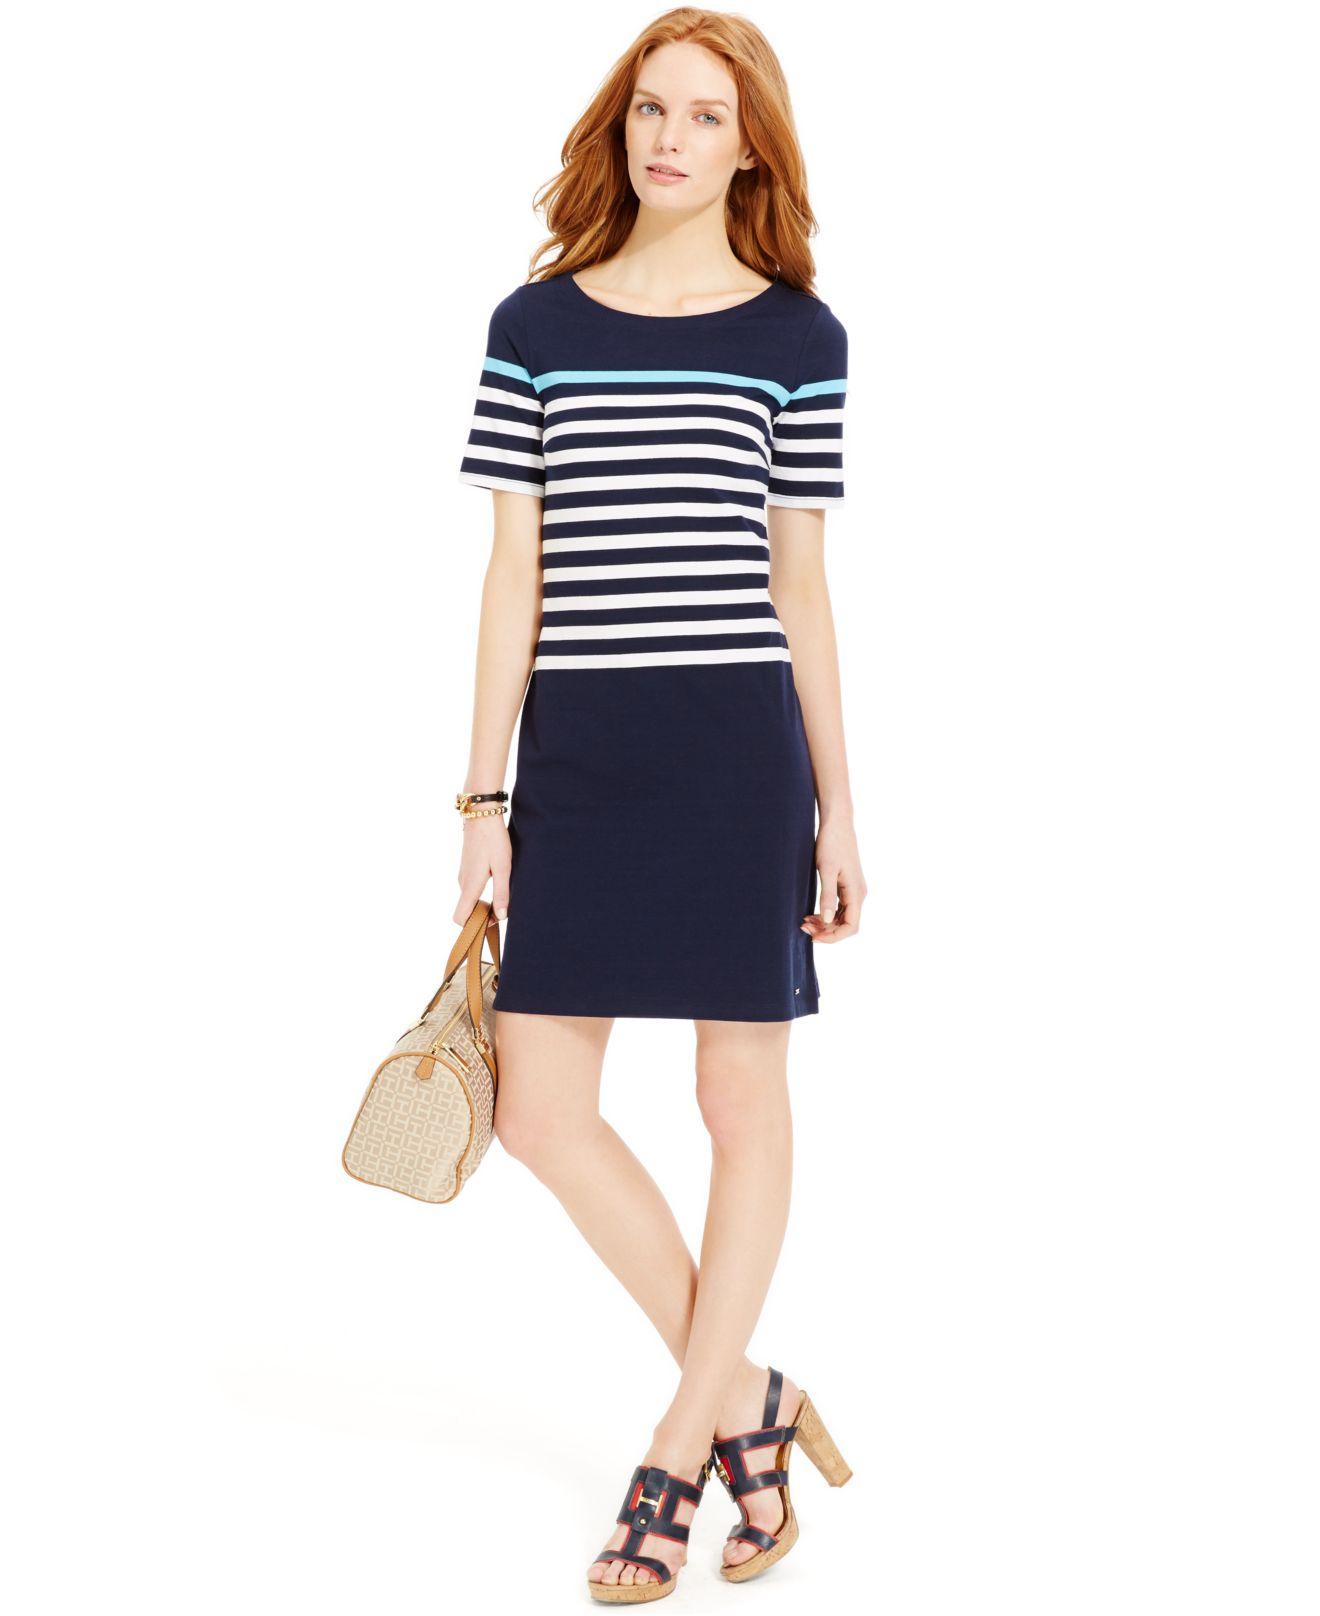 7b24e3cb Tommy Hilfiger Colorblock Striped T-shirt Dress in Blue - Lyst